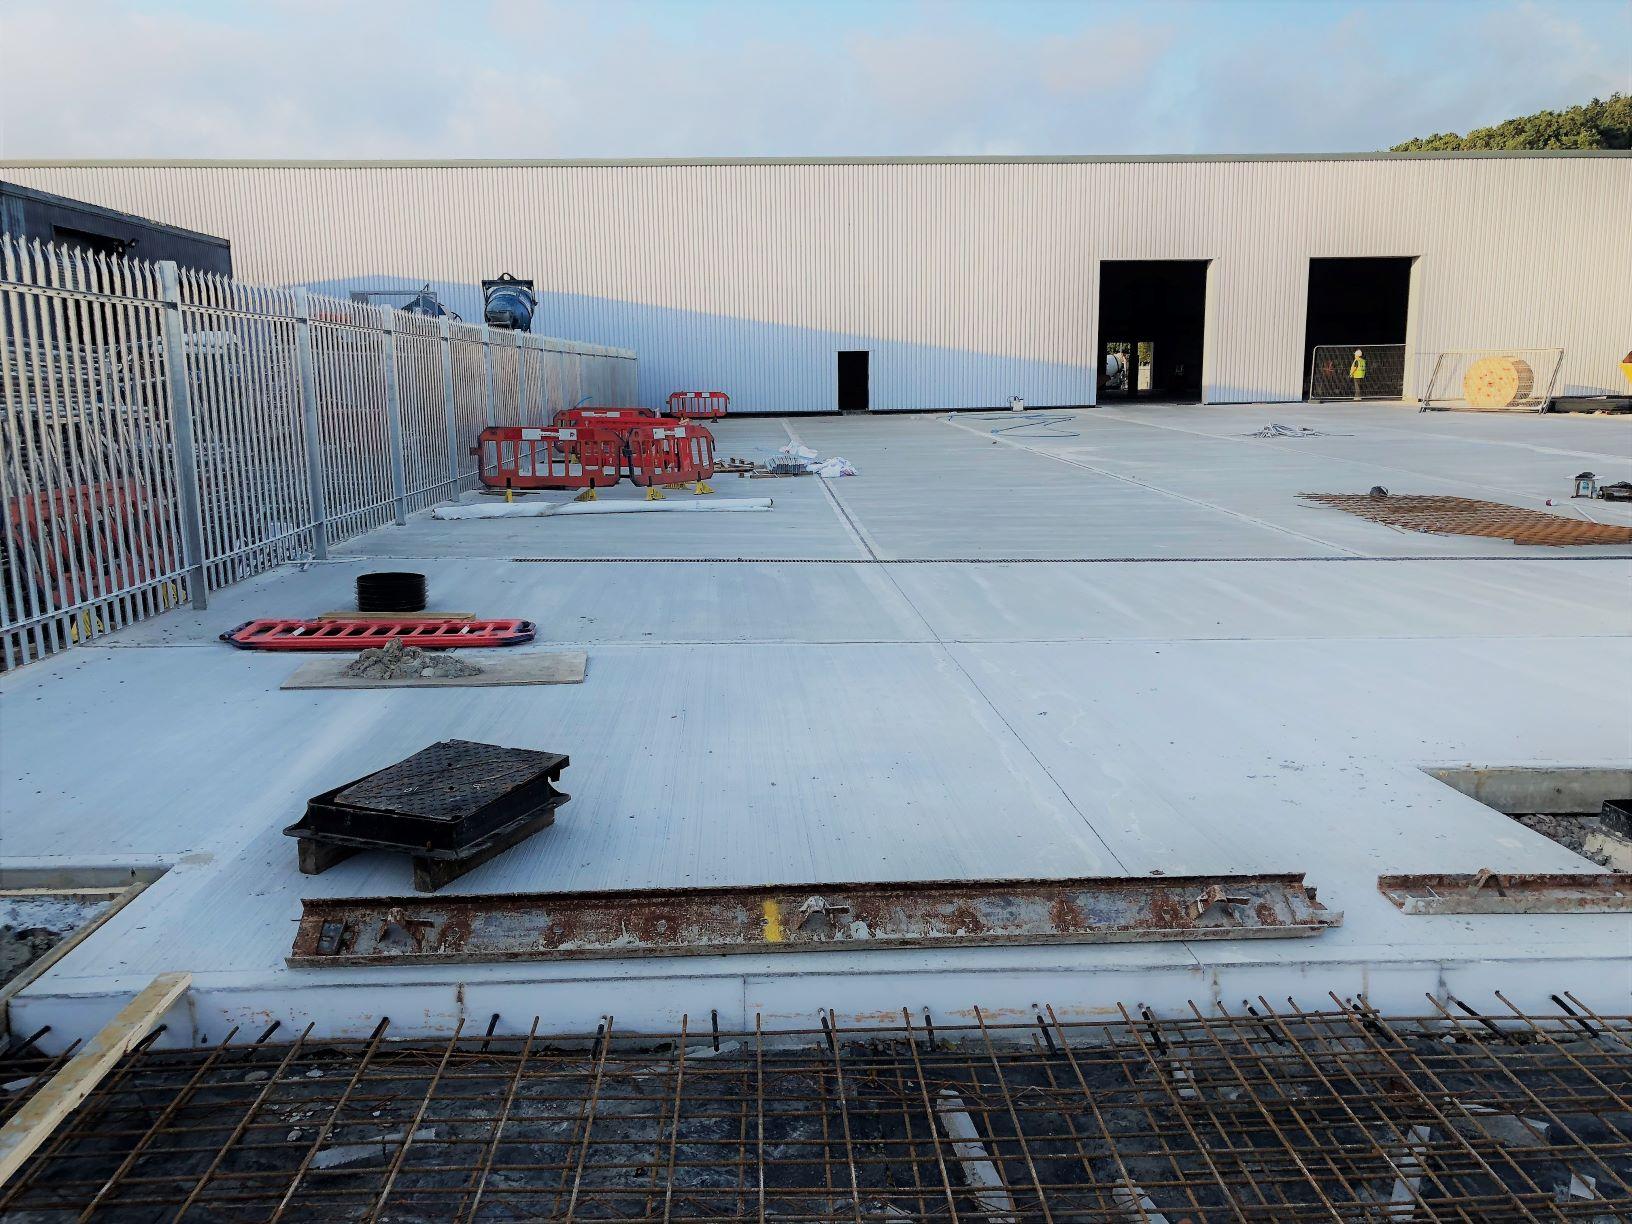 Carlsberg Building - reinforced concrete HGV yard